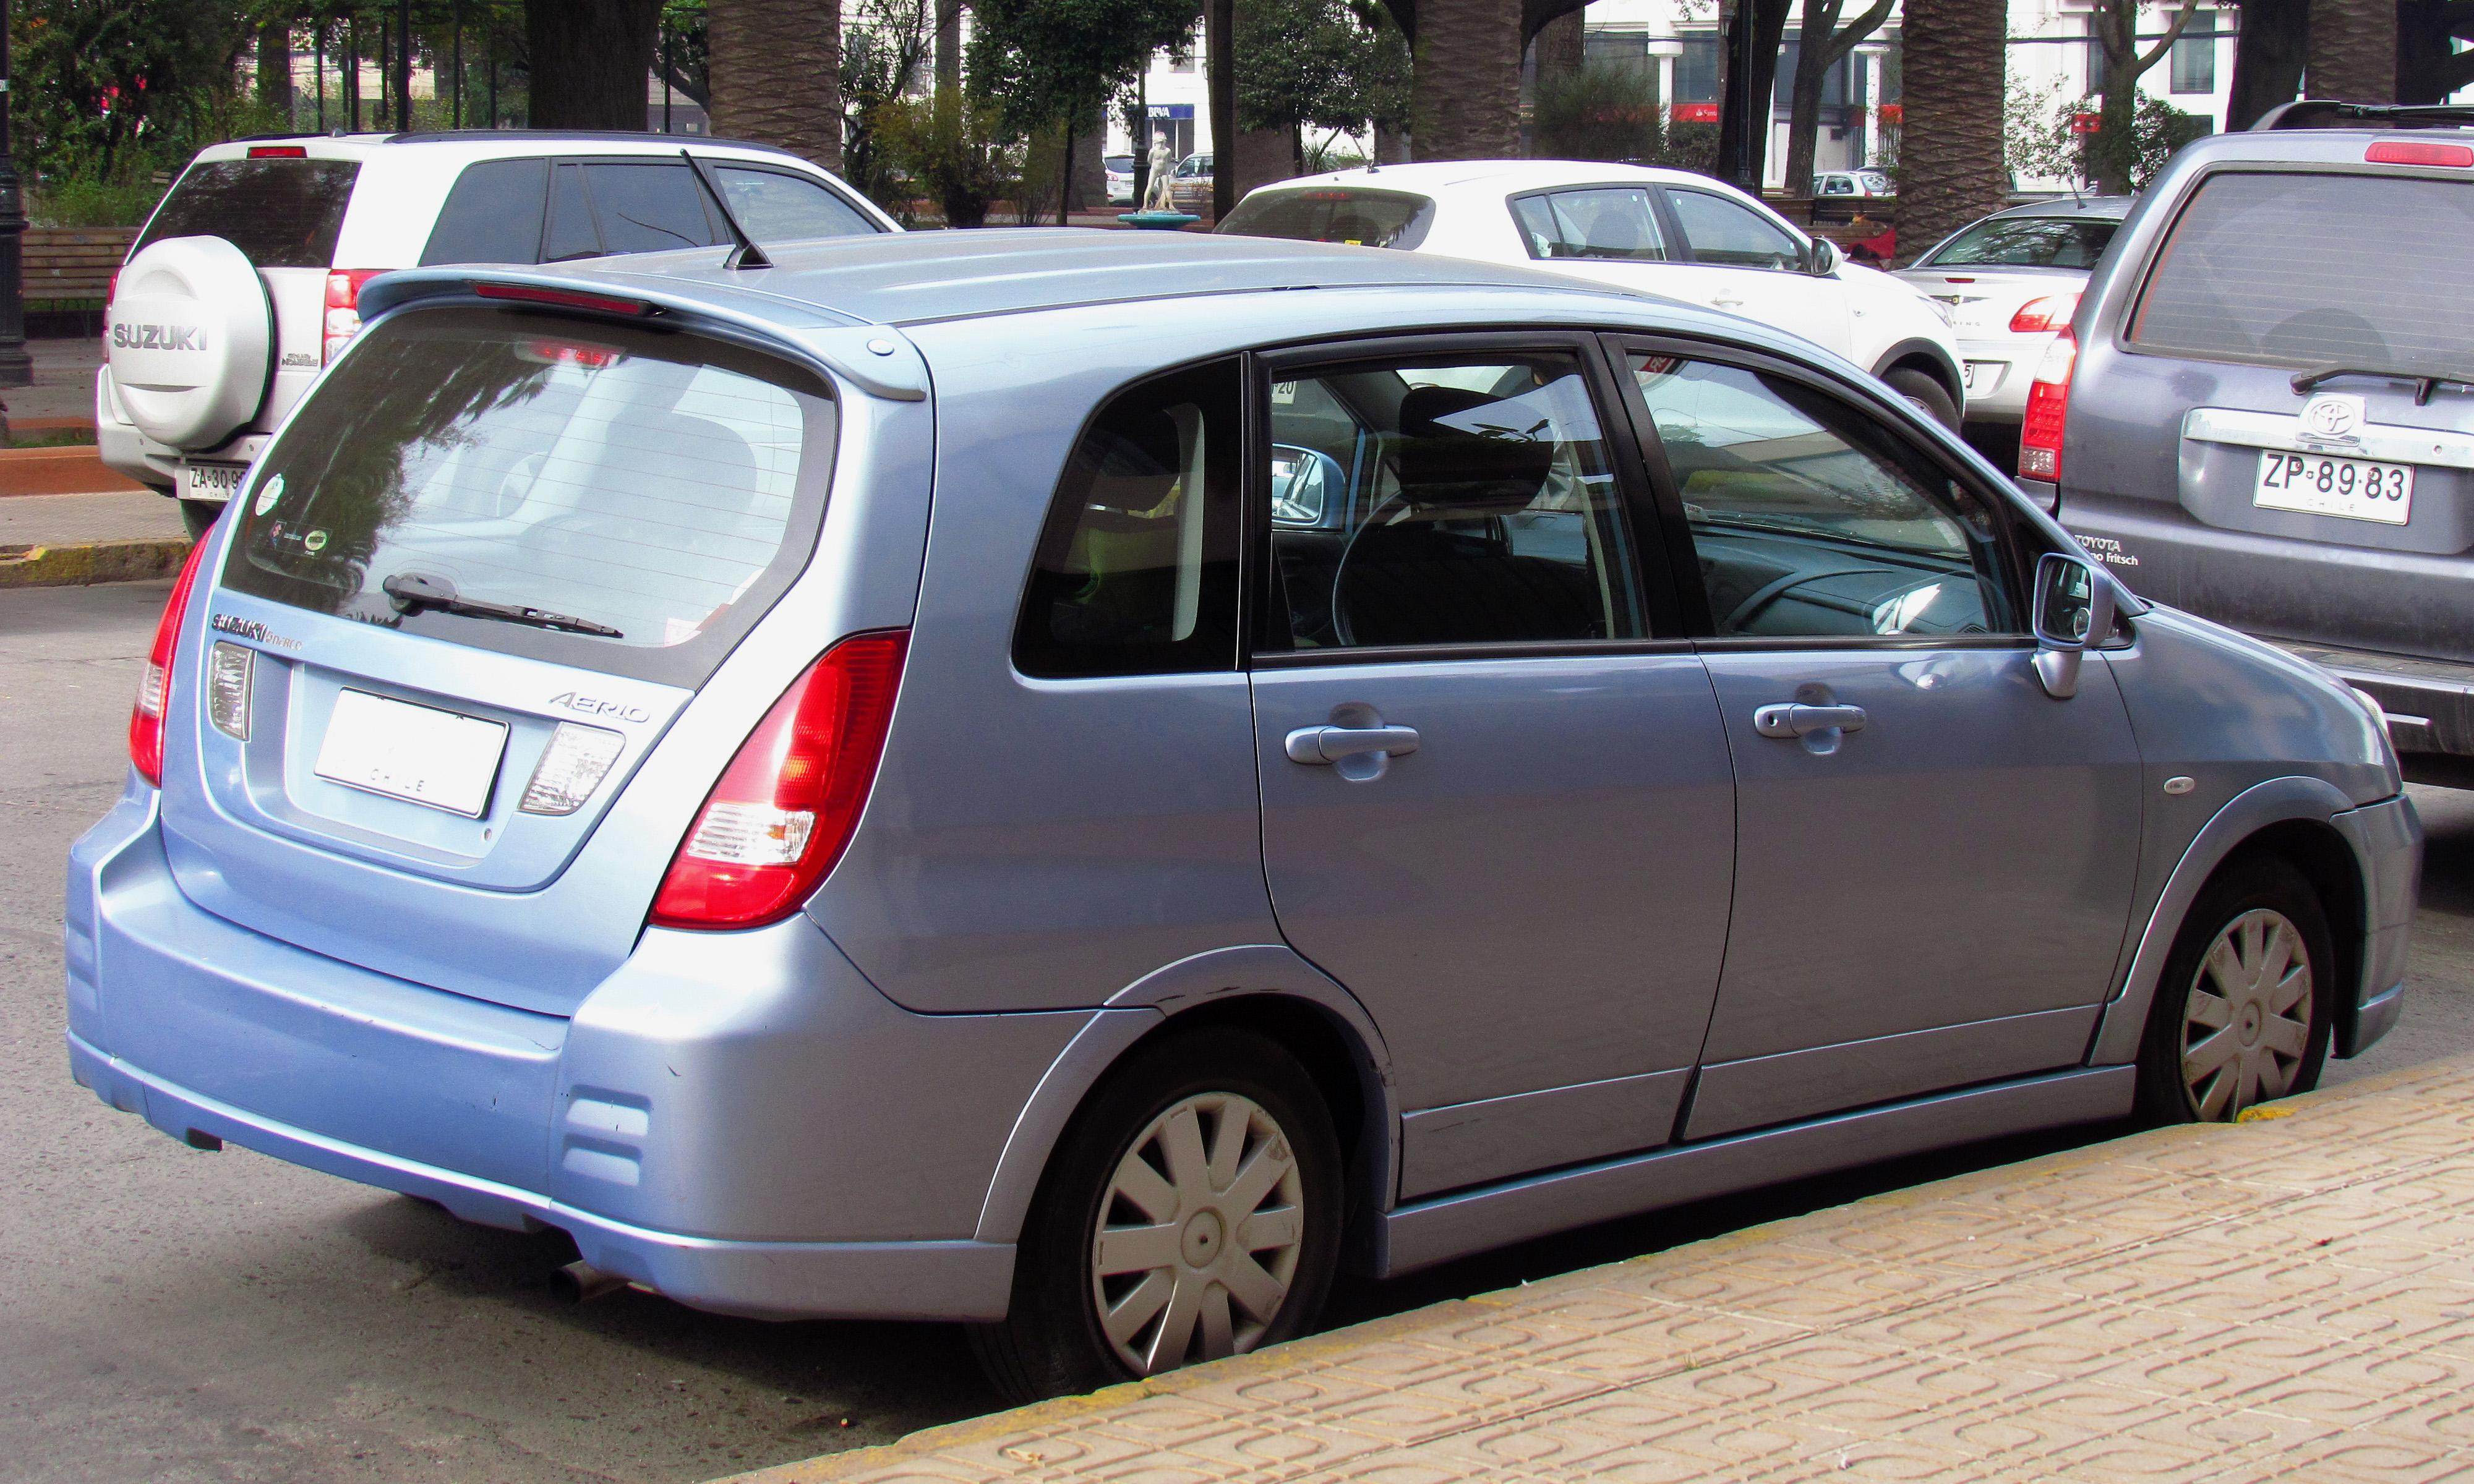 file suzuki aerio sx glx 2004 44491433012 jpg wikimedia commons https commons wikimedia org wiki file suzuki aerio sx glx 2004 44491433012 jpg